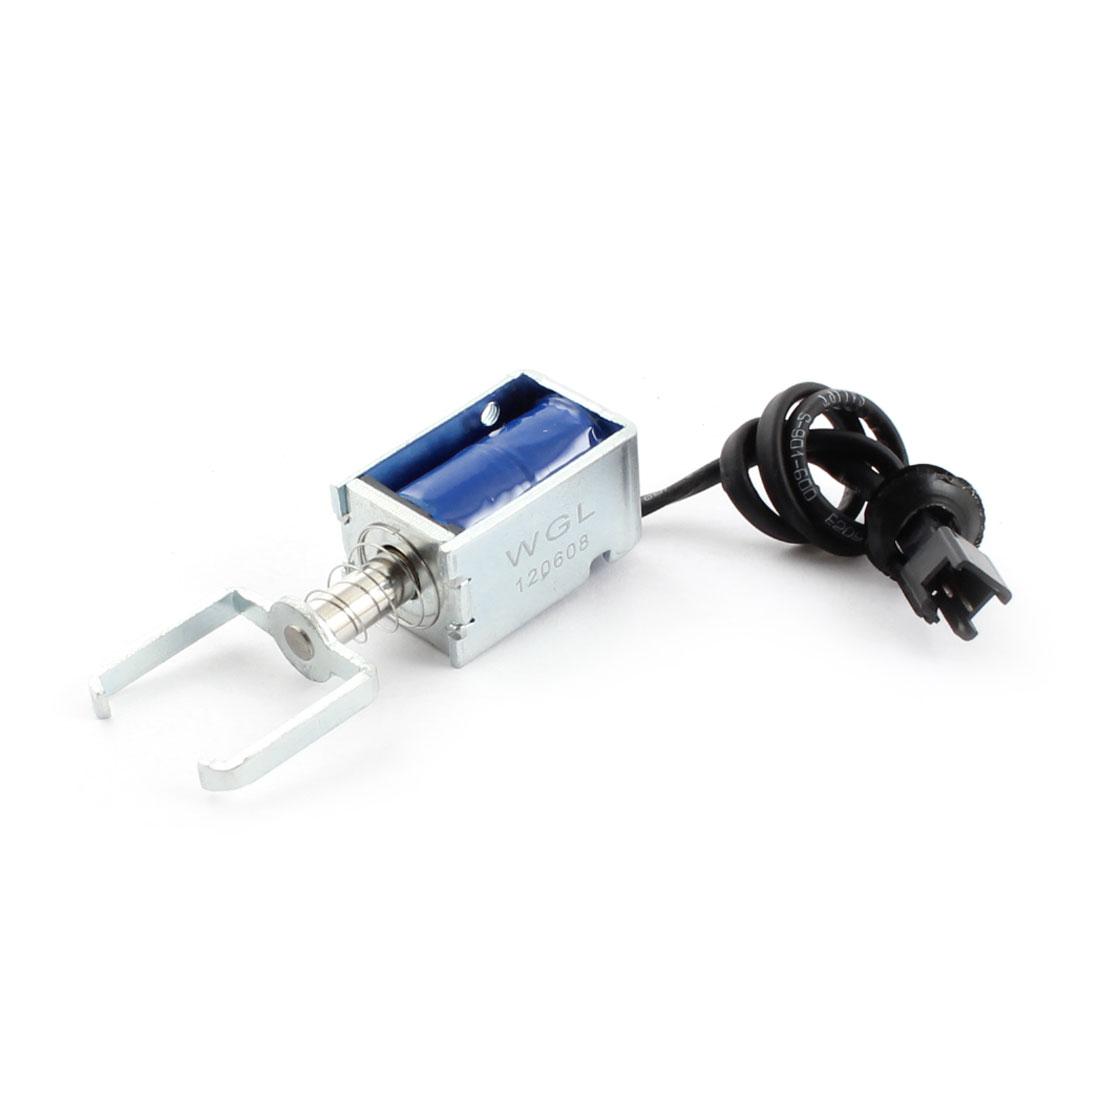 DC 12V 350g/3mm Open Frame Actuator Linear Pull Solenoid Electromagnet